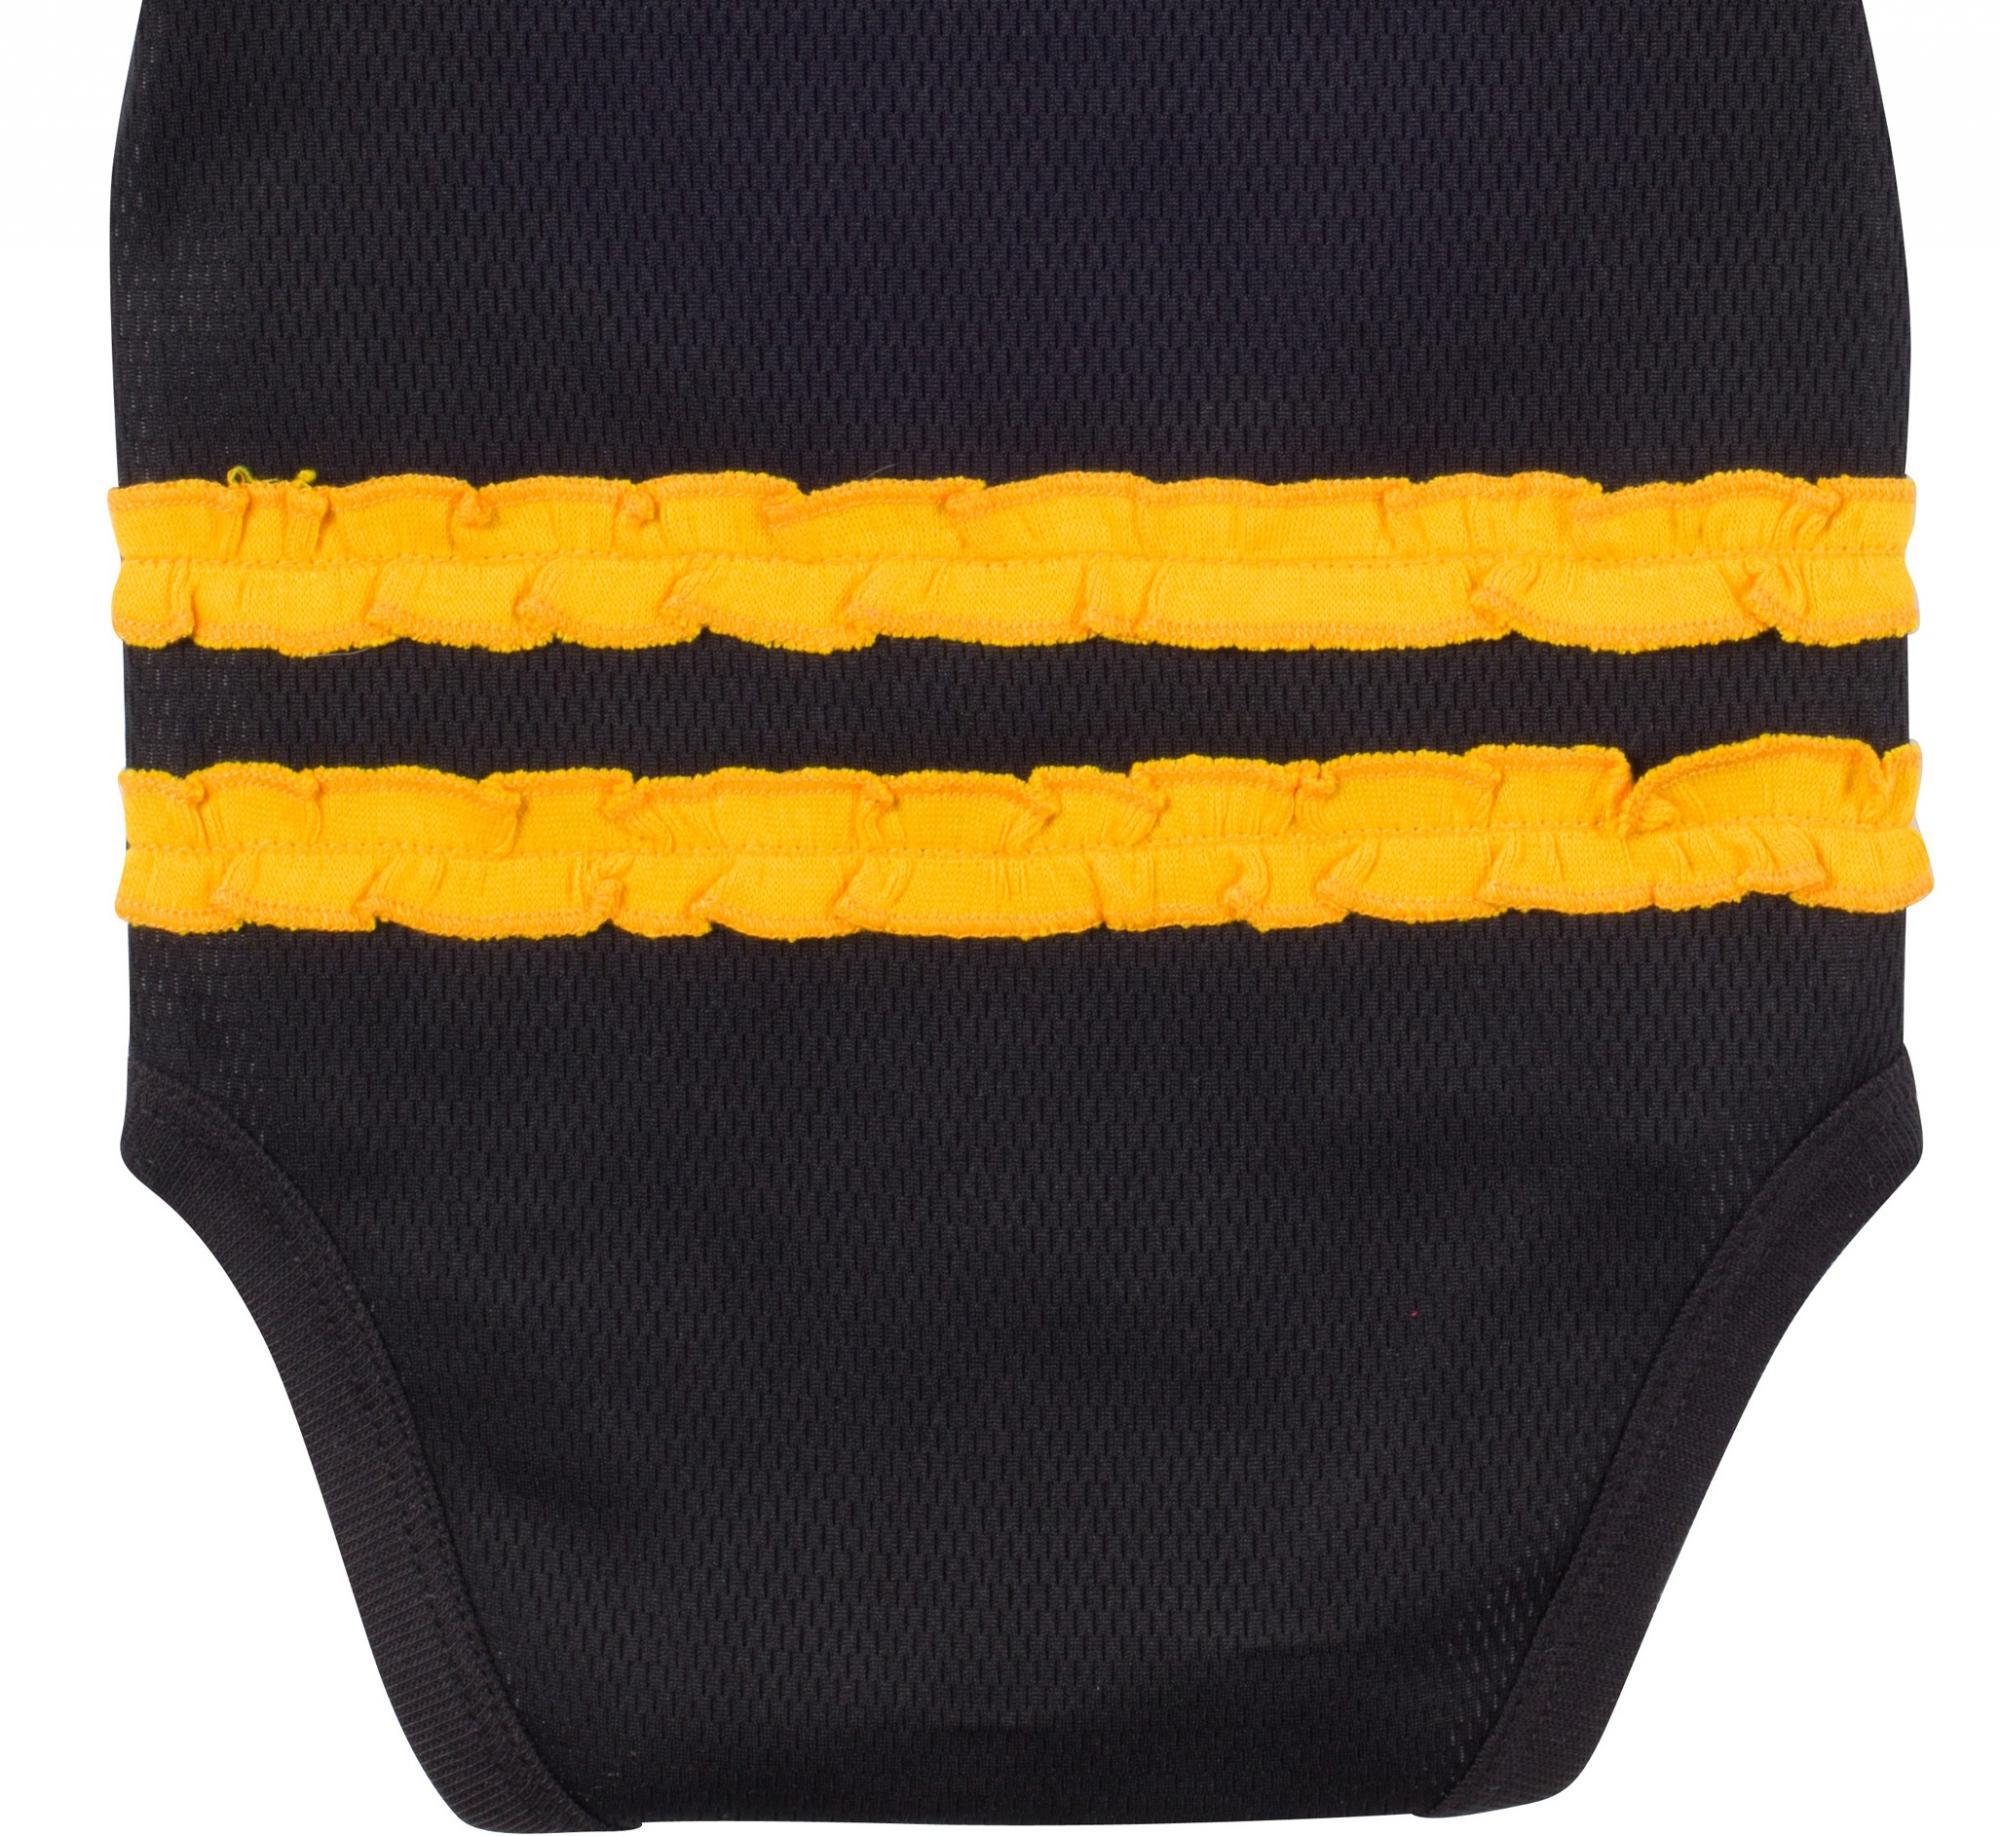 steelers-baby-rufflebutt-player-jersey-bodysuit-1680-back-close.jpg